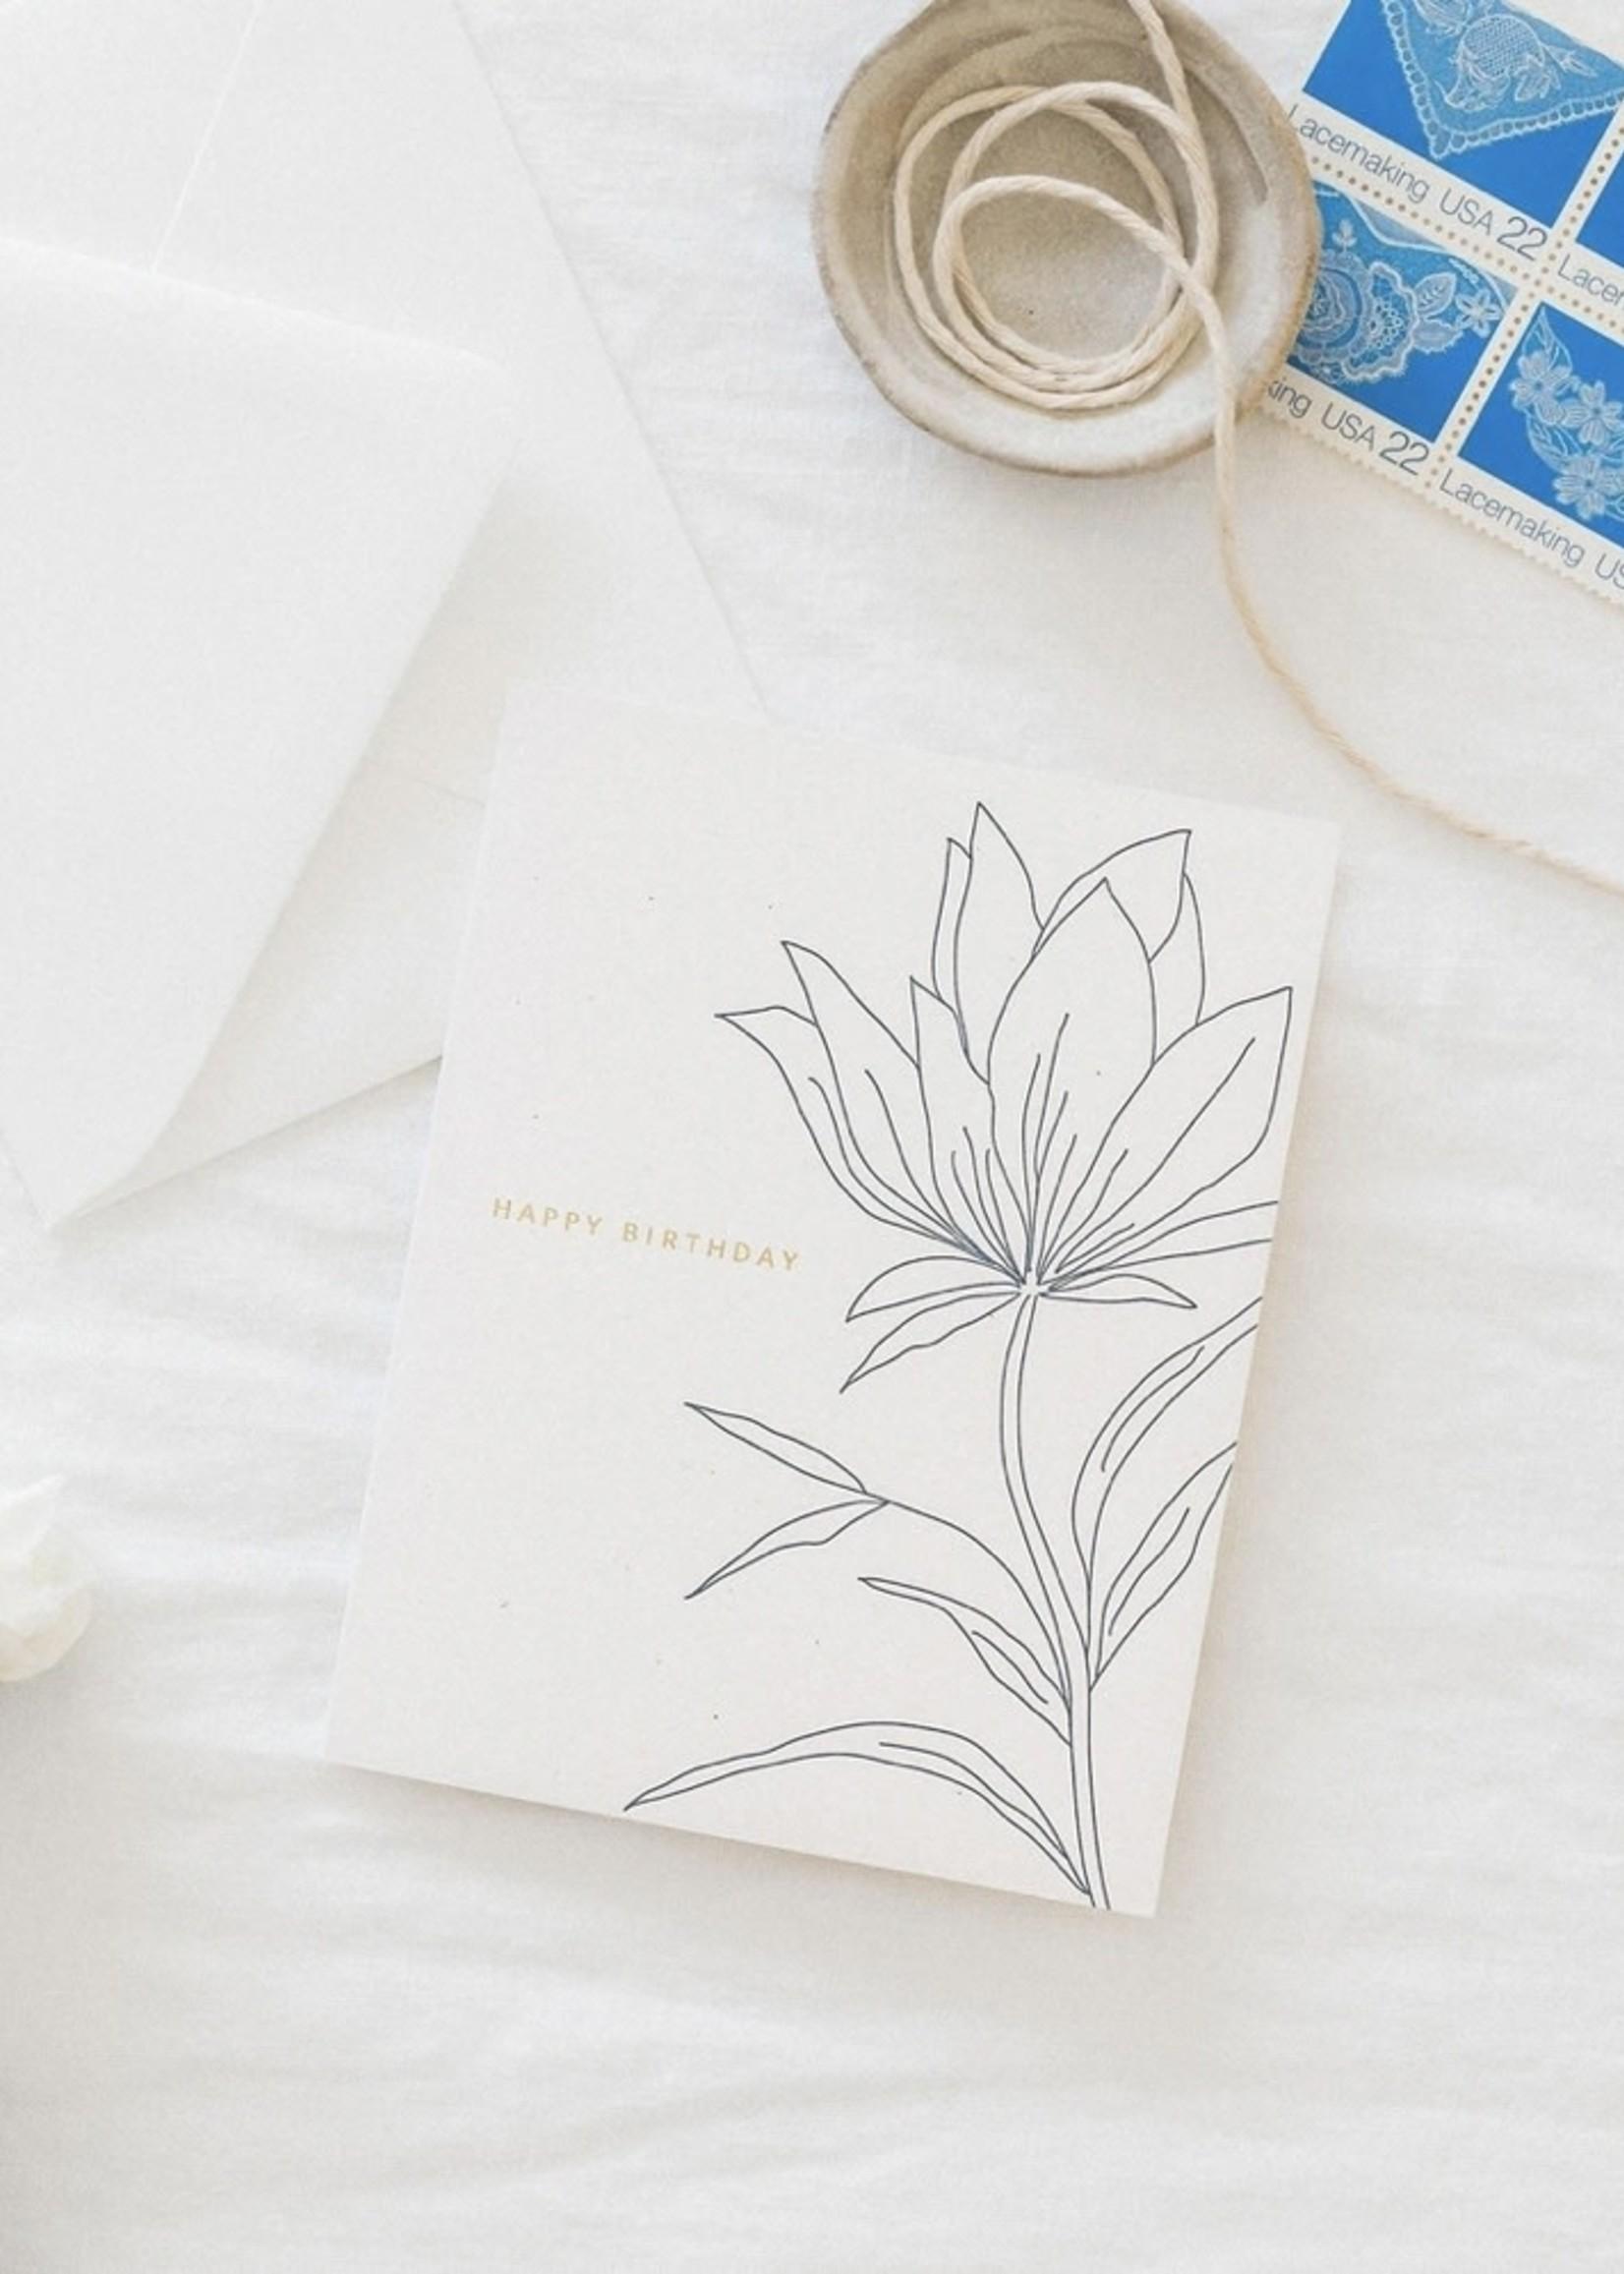 RAMONA + RUTH Birthday Botanical Card